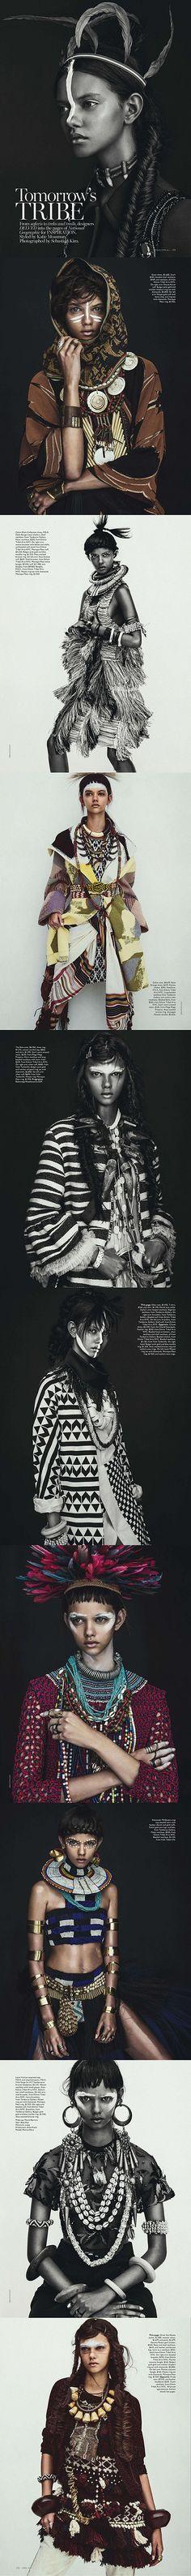 Vogue Australia April 2014 || Title: Tomorrow's Tribe || Model: Marina Nery || Photographer: Sebastian Kim || Fashion Editor: Katie Mossman || Hair: Bok-Hee || Make-up: Mariel Barrera #fashion #edito